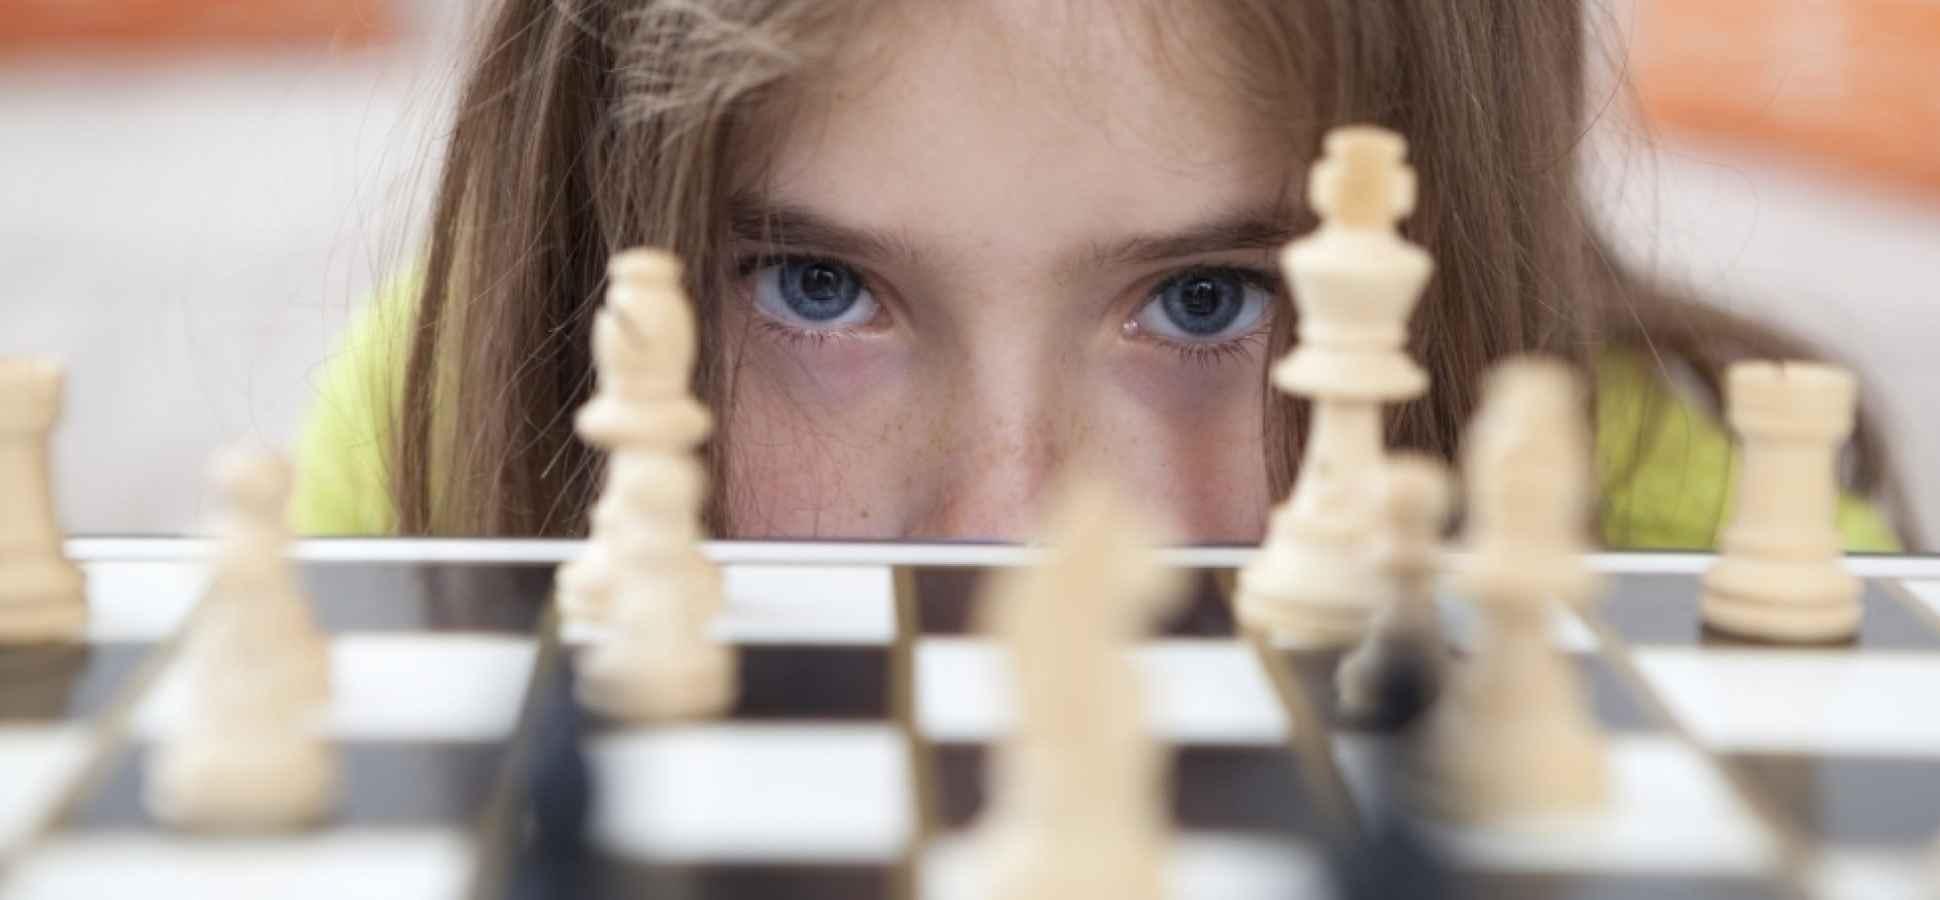 3 Mental Habits That Set True Geniuses Apart